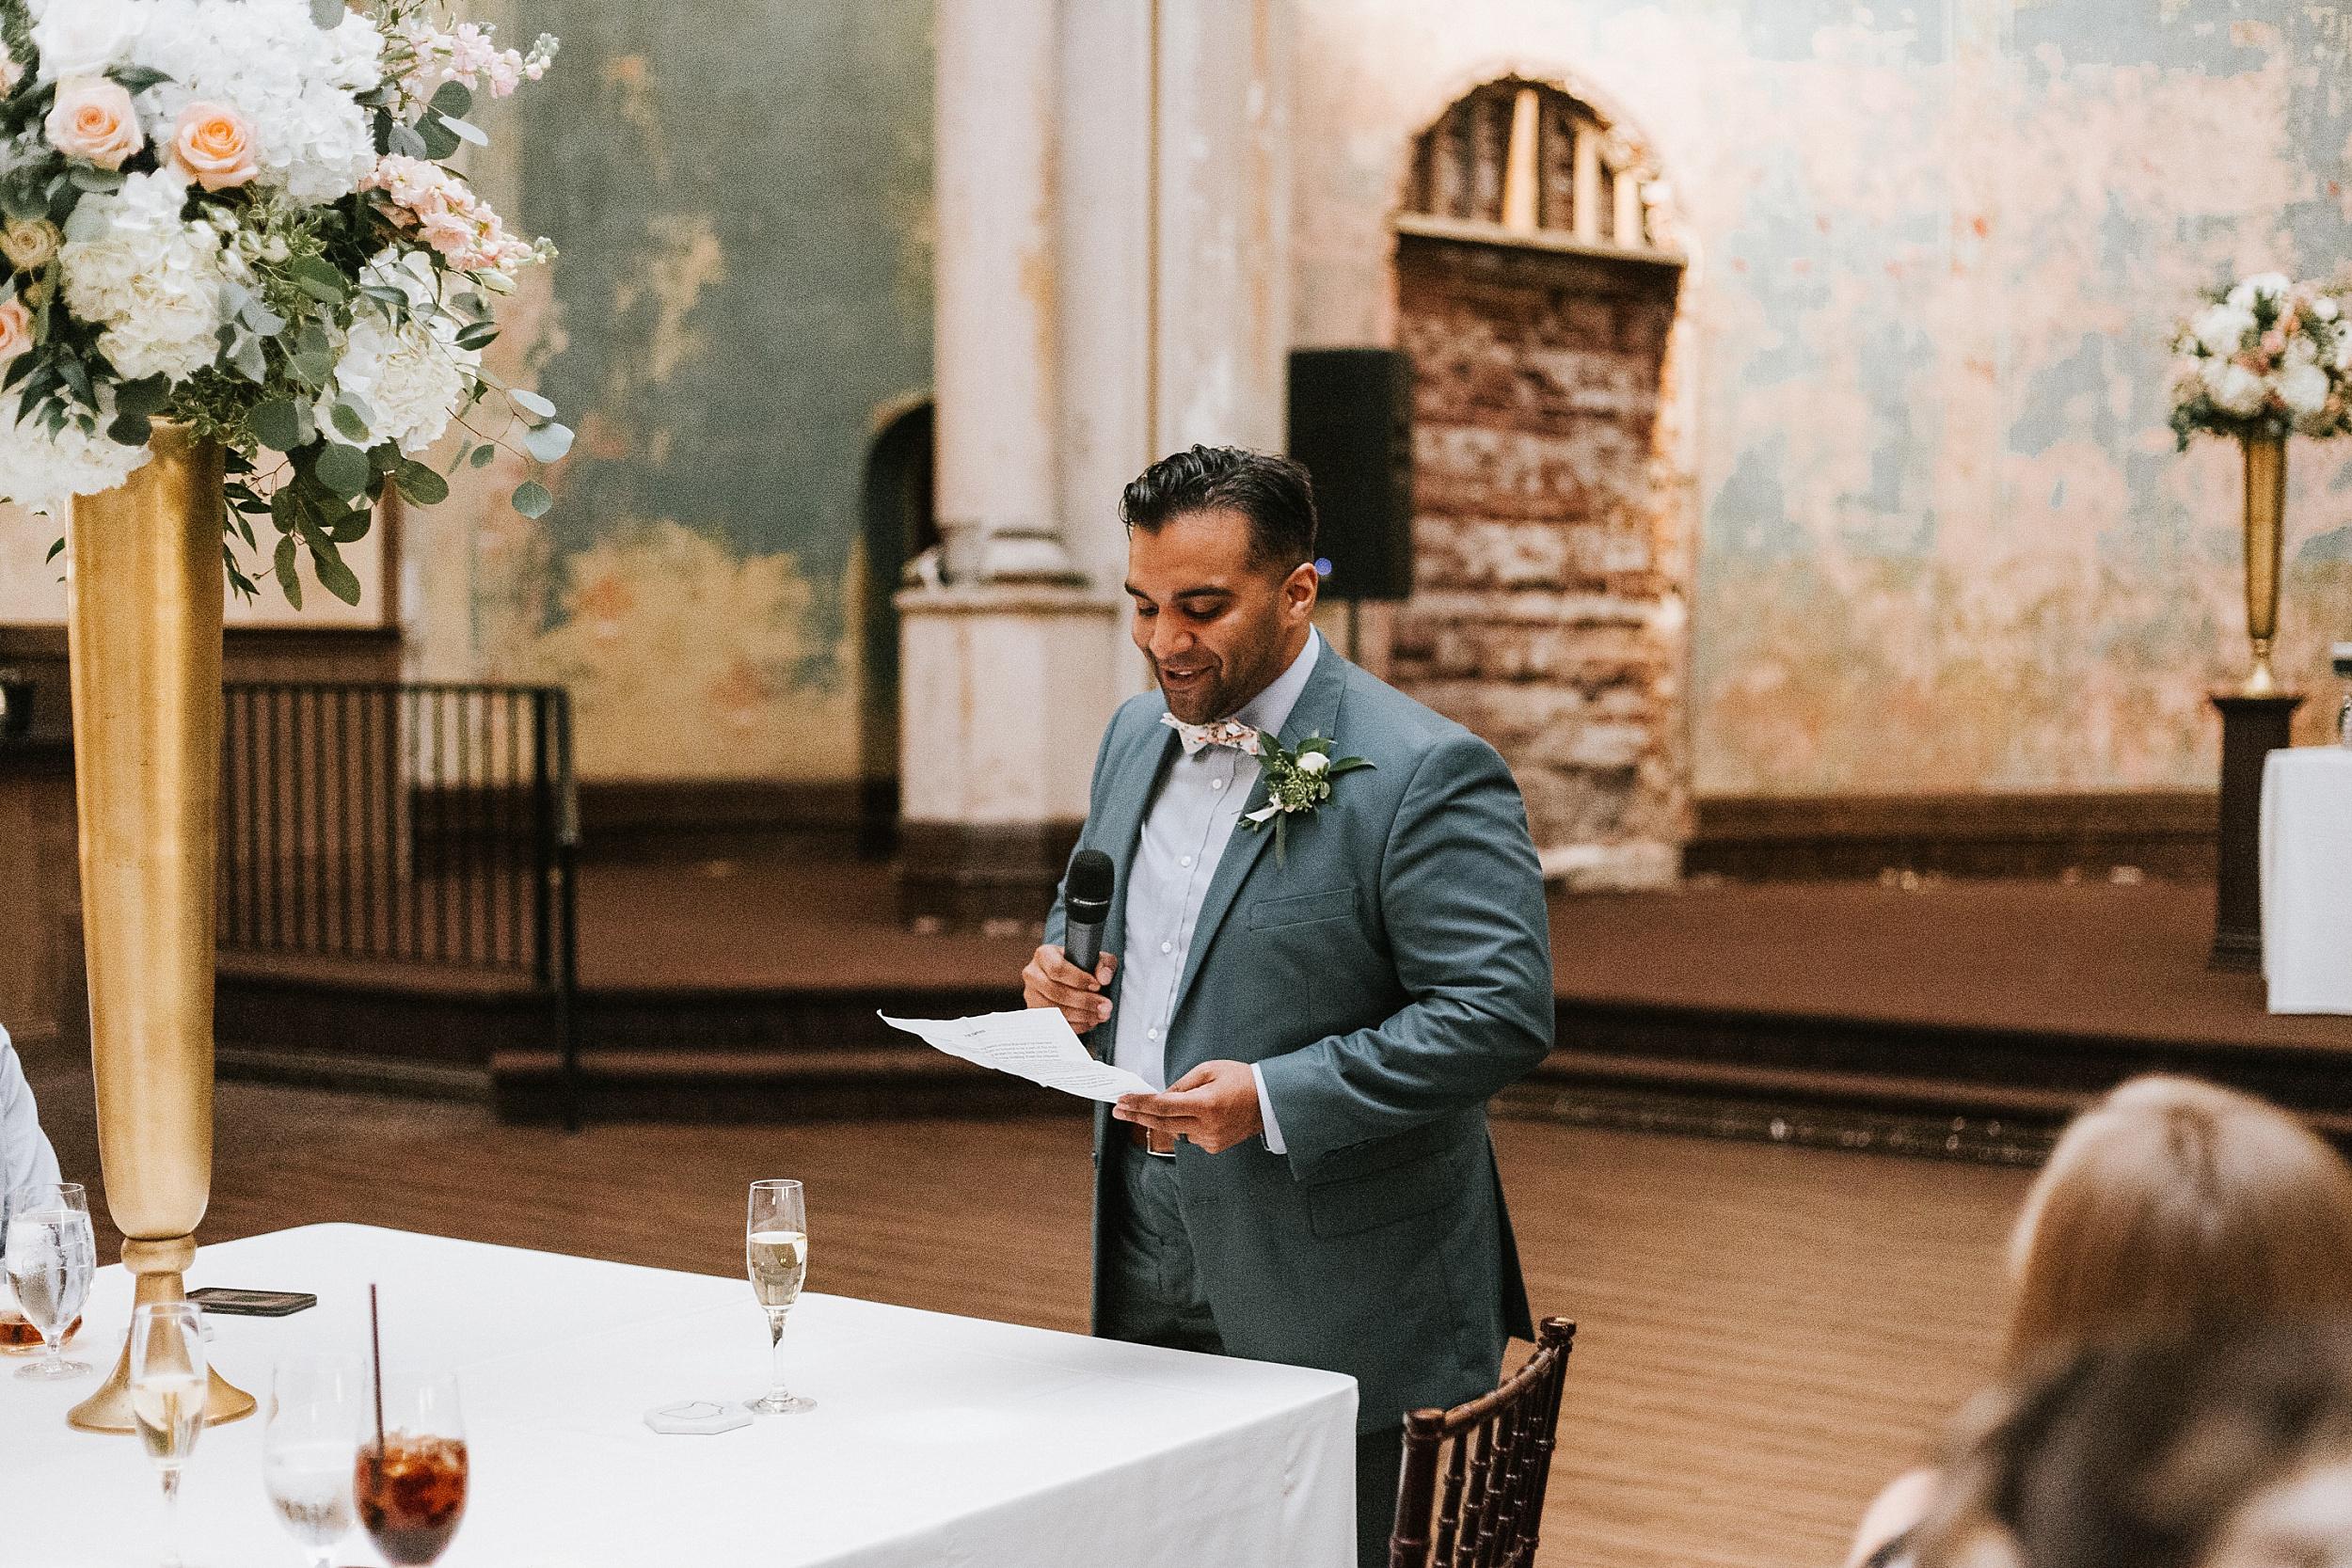 Brooke Townsend Photography - Cincinnati Wedding Photographer (152 of 170).jpg